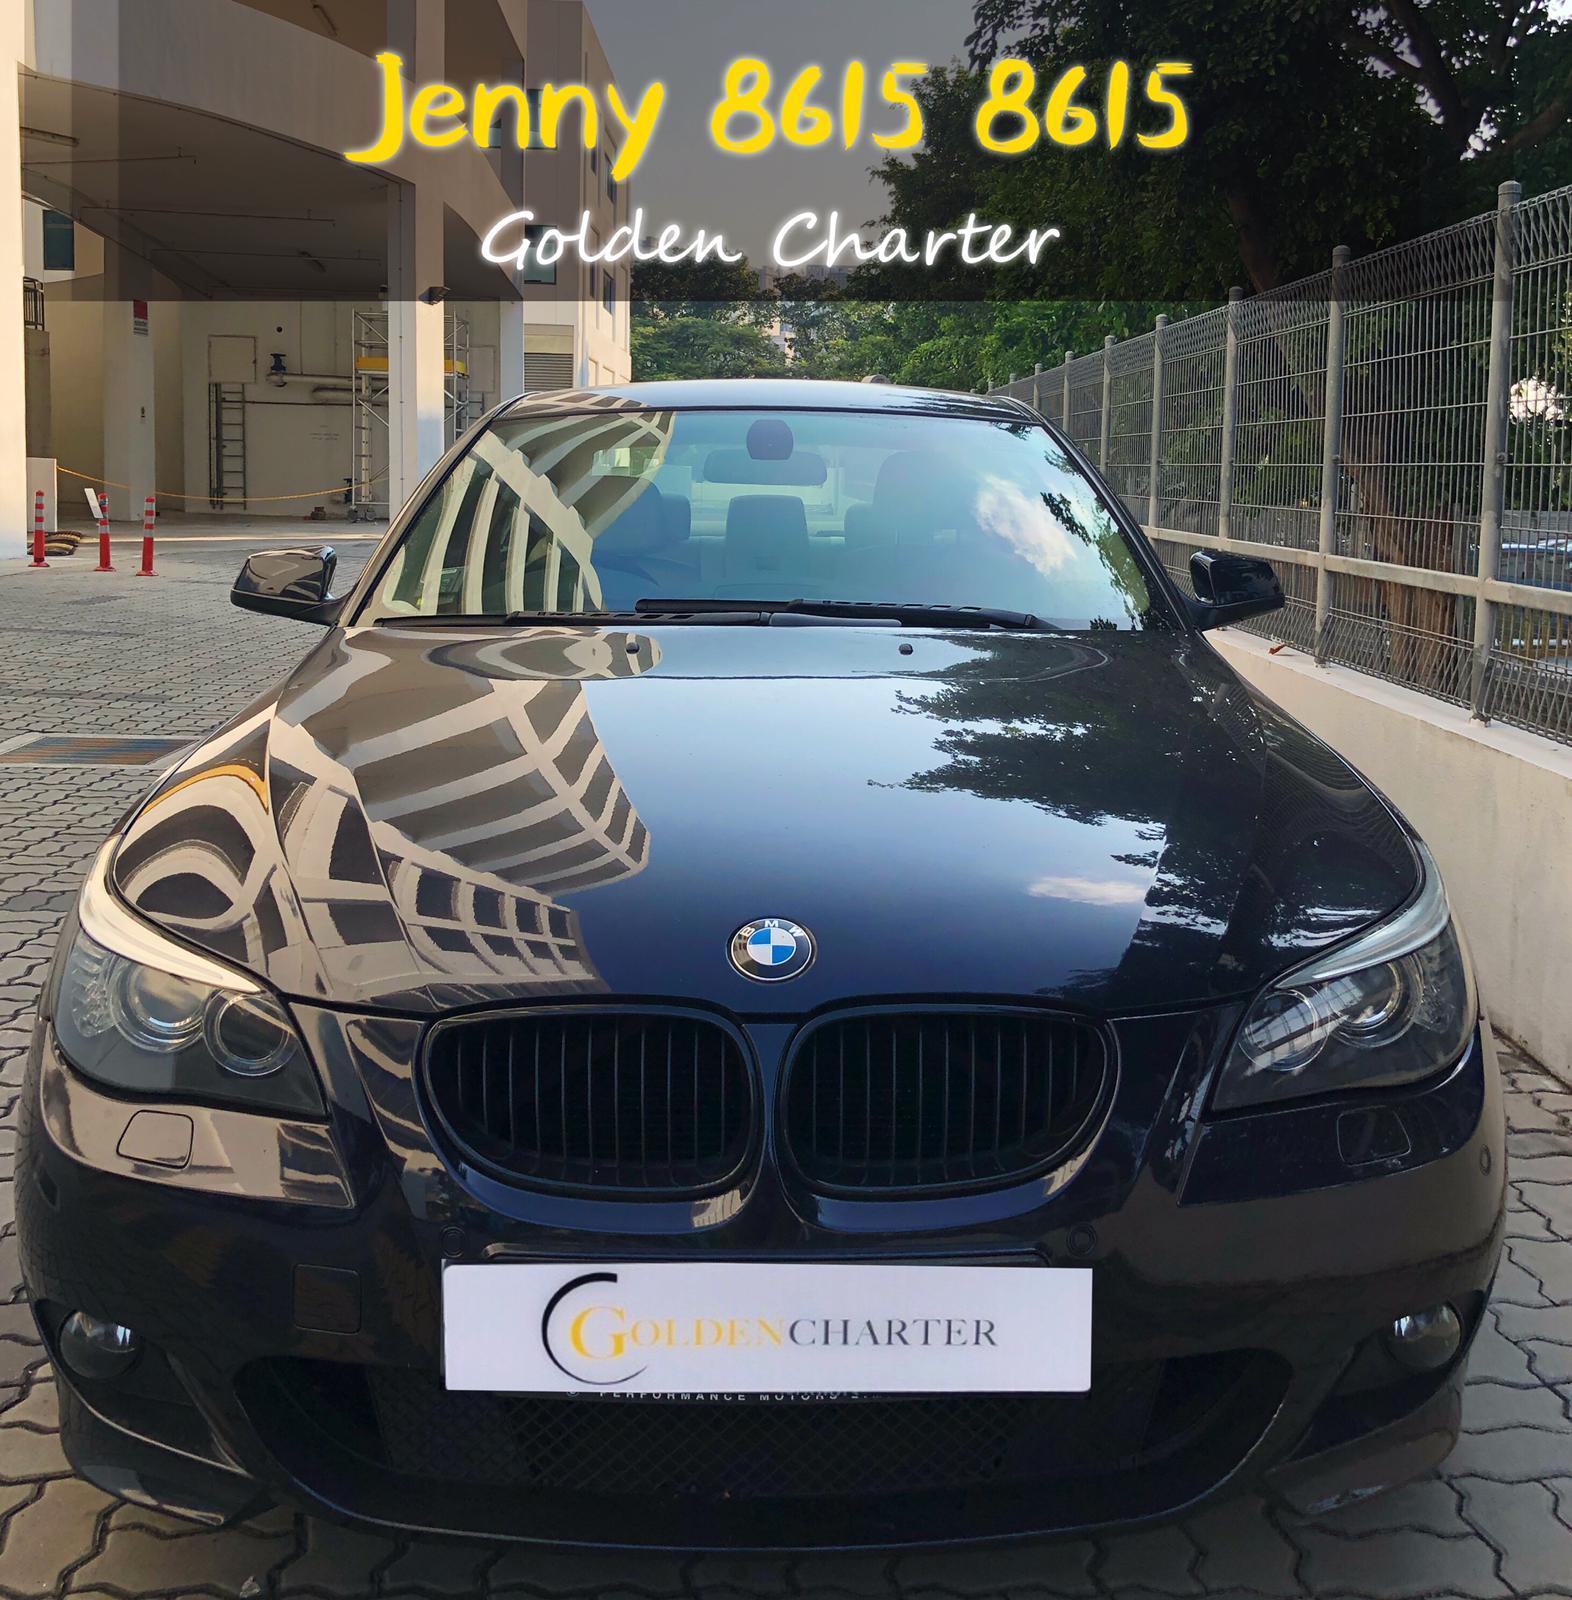 BMW 520 1.8a CONTI CAR rent personal use grab gojek long term.cheap rental